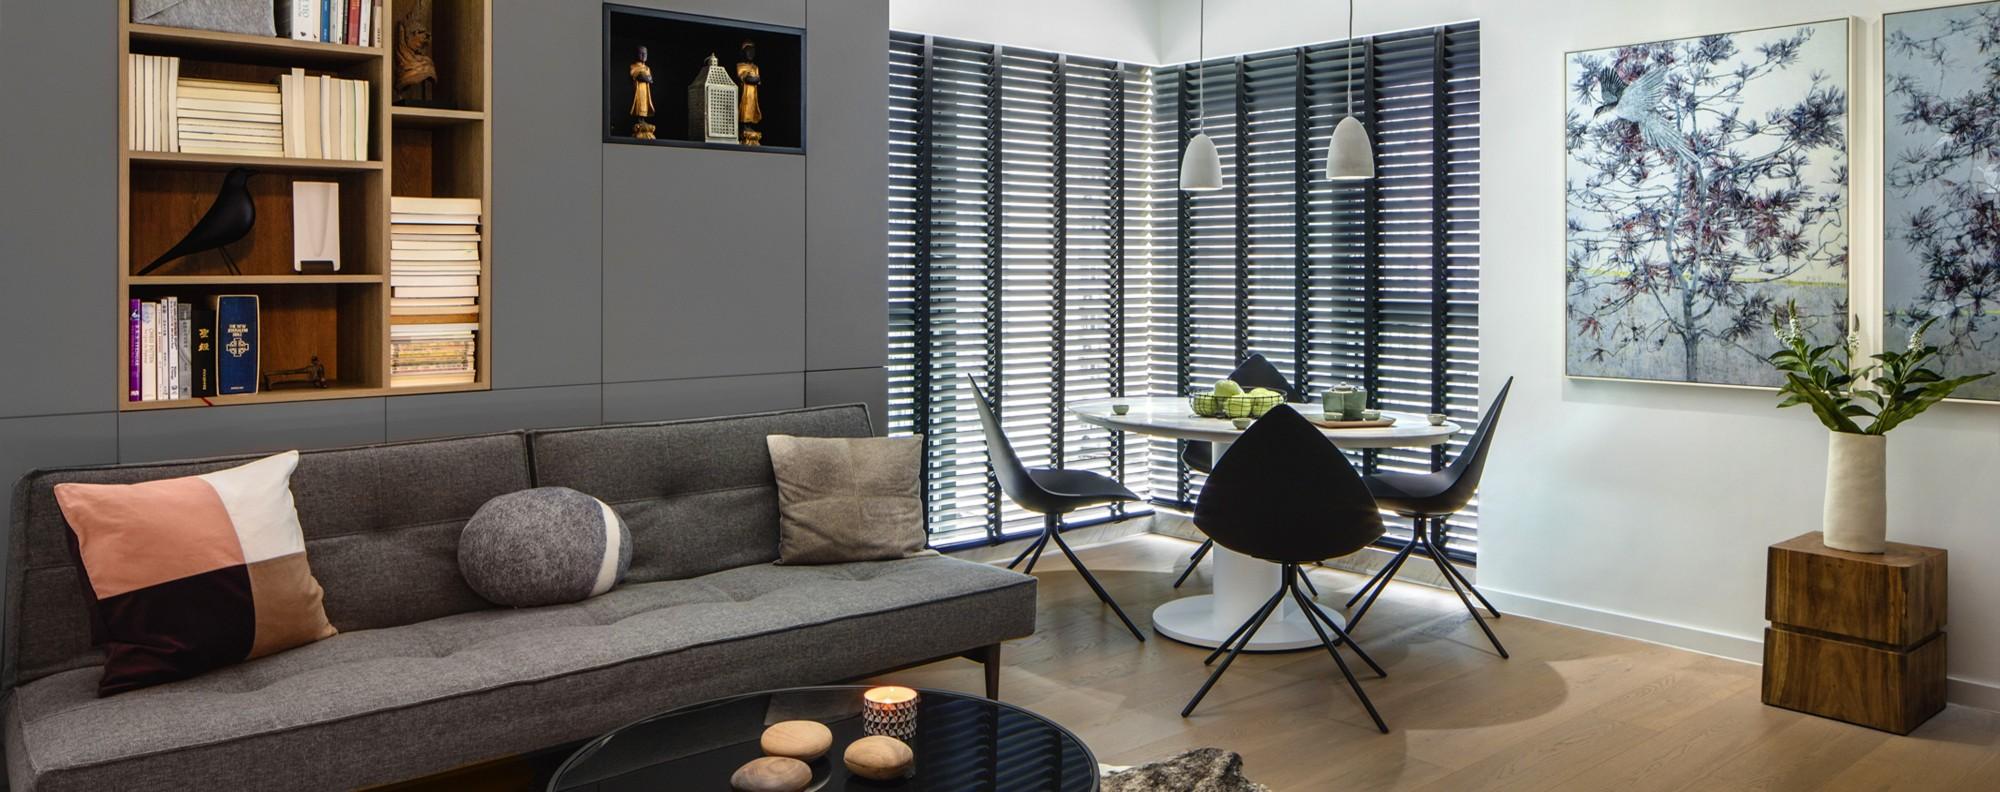 Winnie Chu's Whampoa flat designed by Dylan Tan.